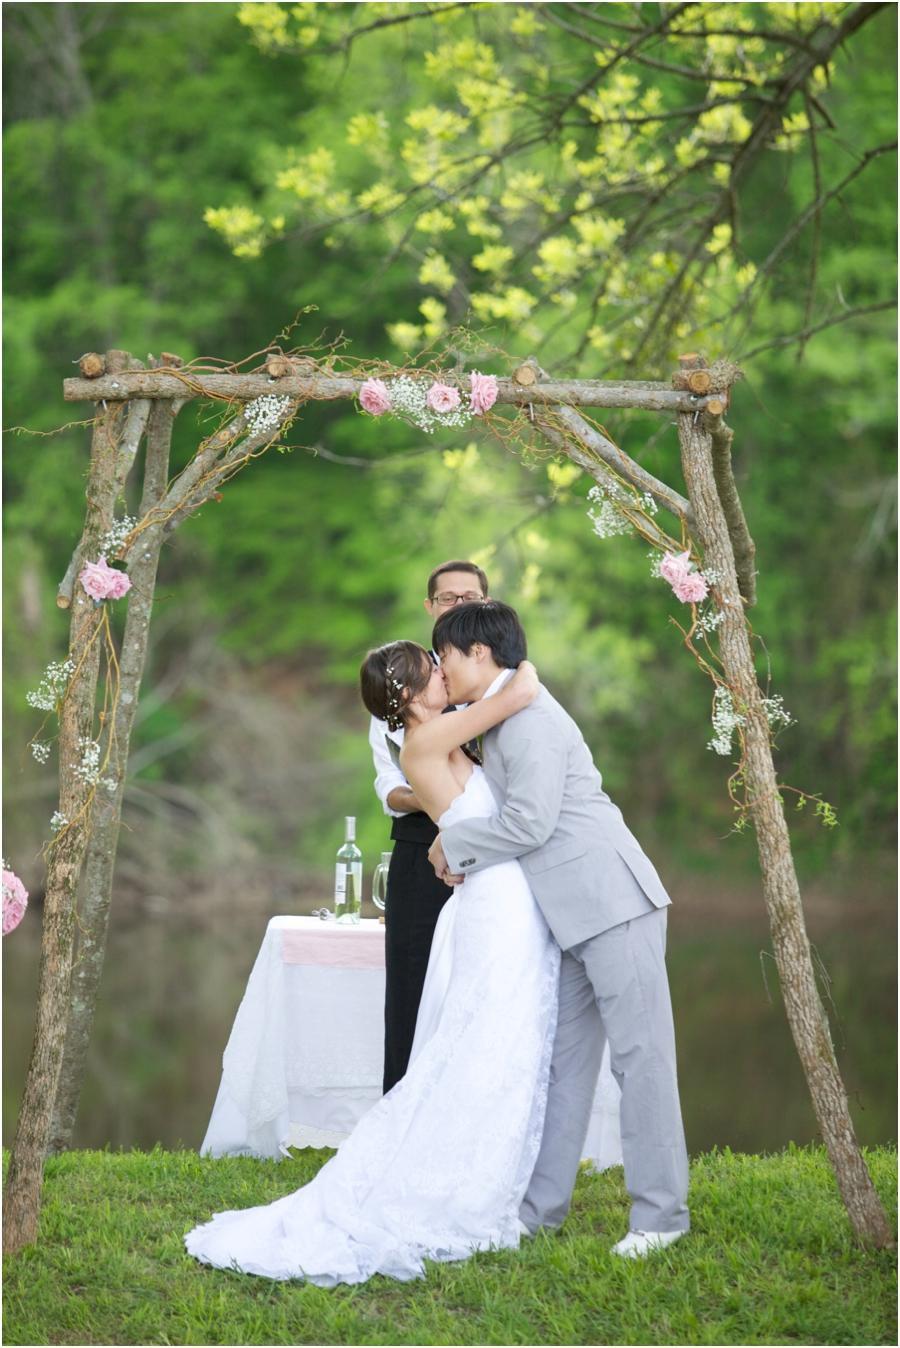 romantic spring wedding portraits, rustic wedding photography